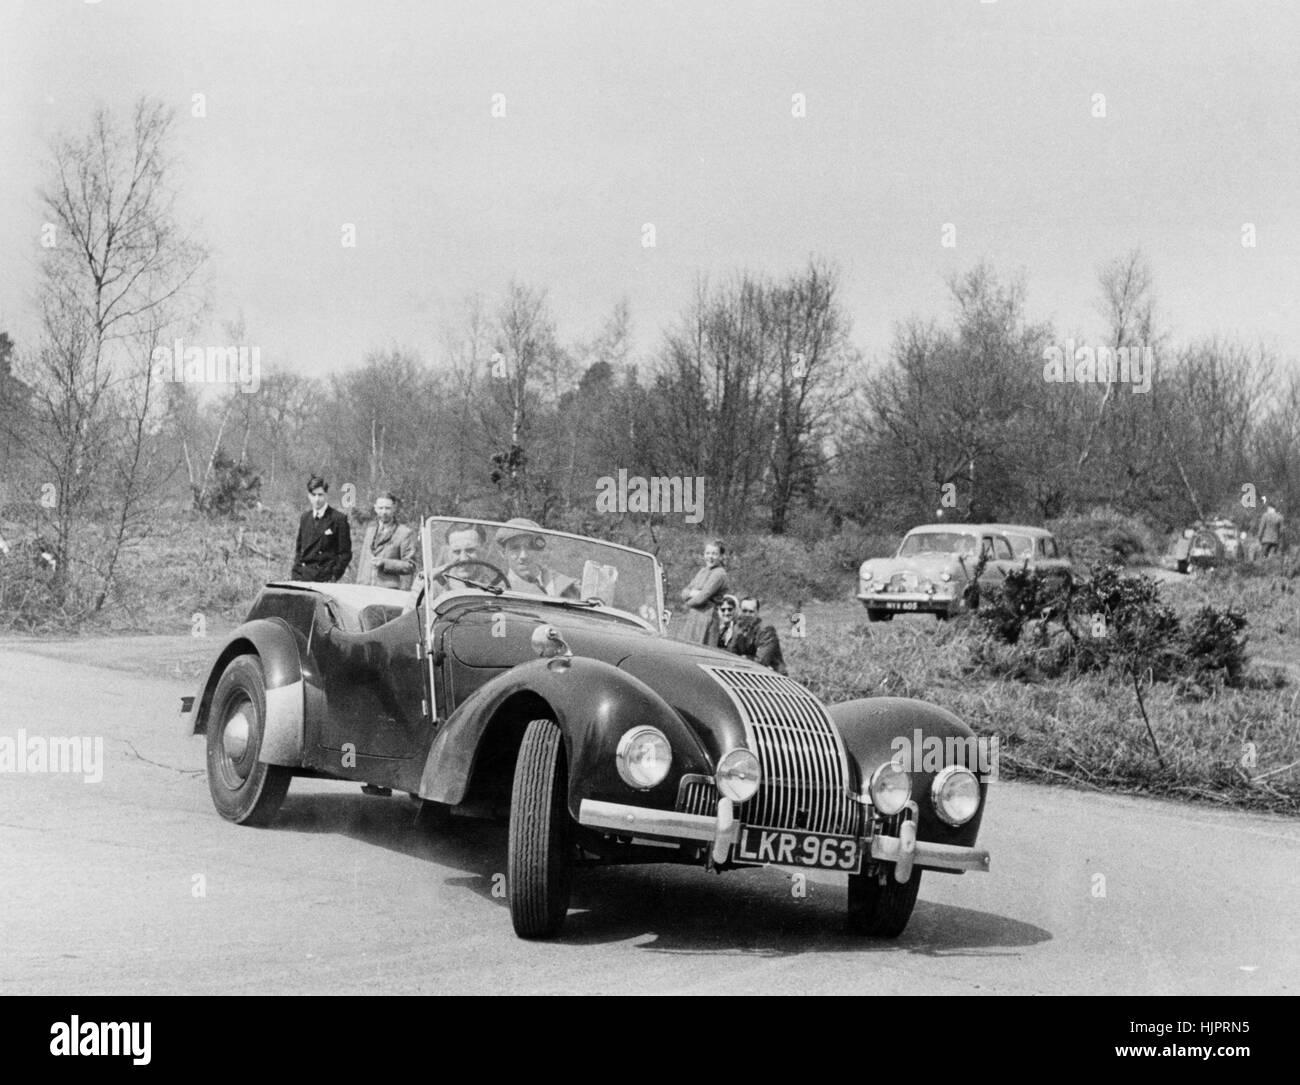 Allard L type  London Motor Club Little Rally 18 March 1953 - Stock Image